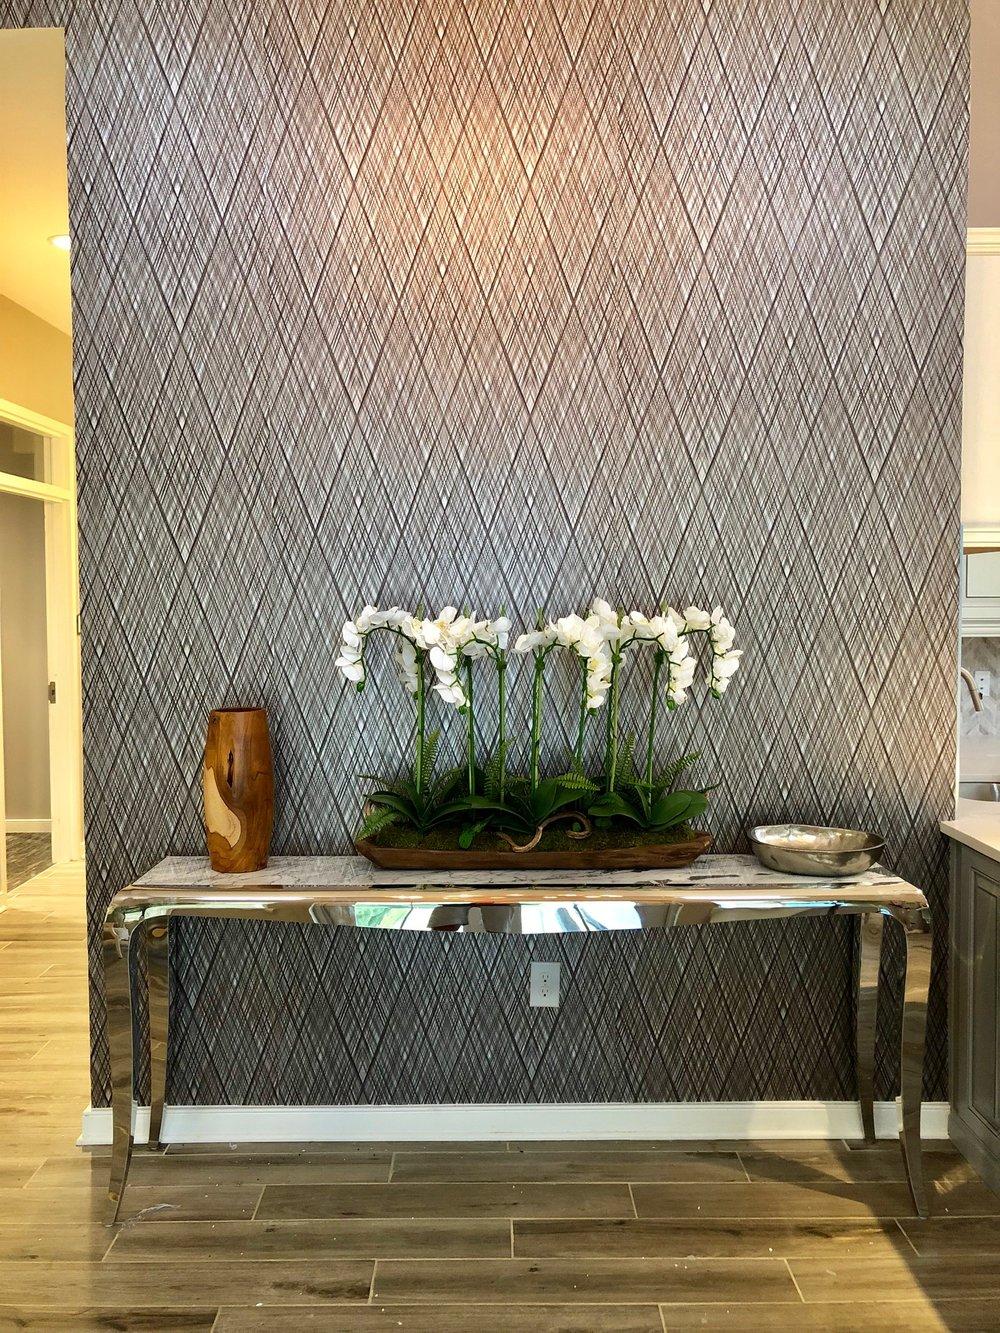 Matthews Interiors - Commercial Interior Design - Wesampton - Entrance.jpg